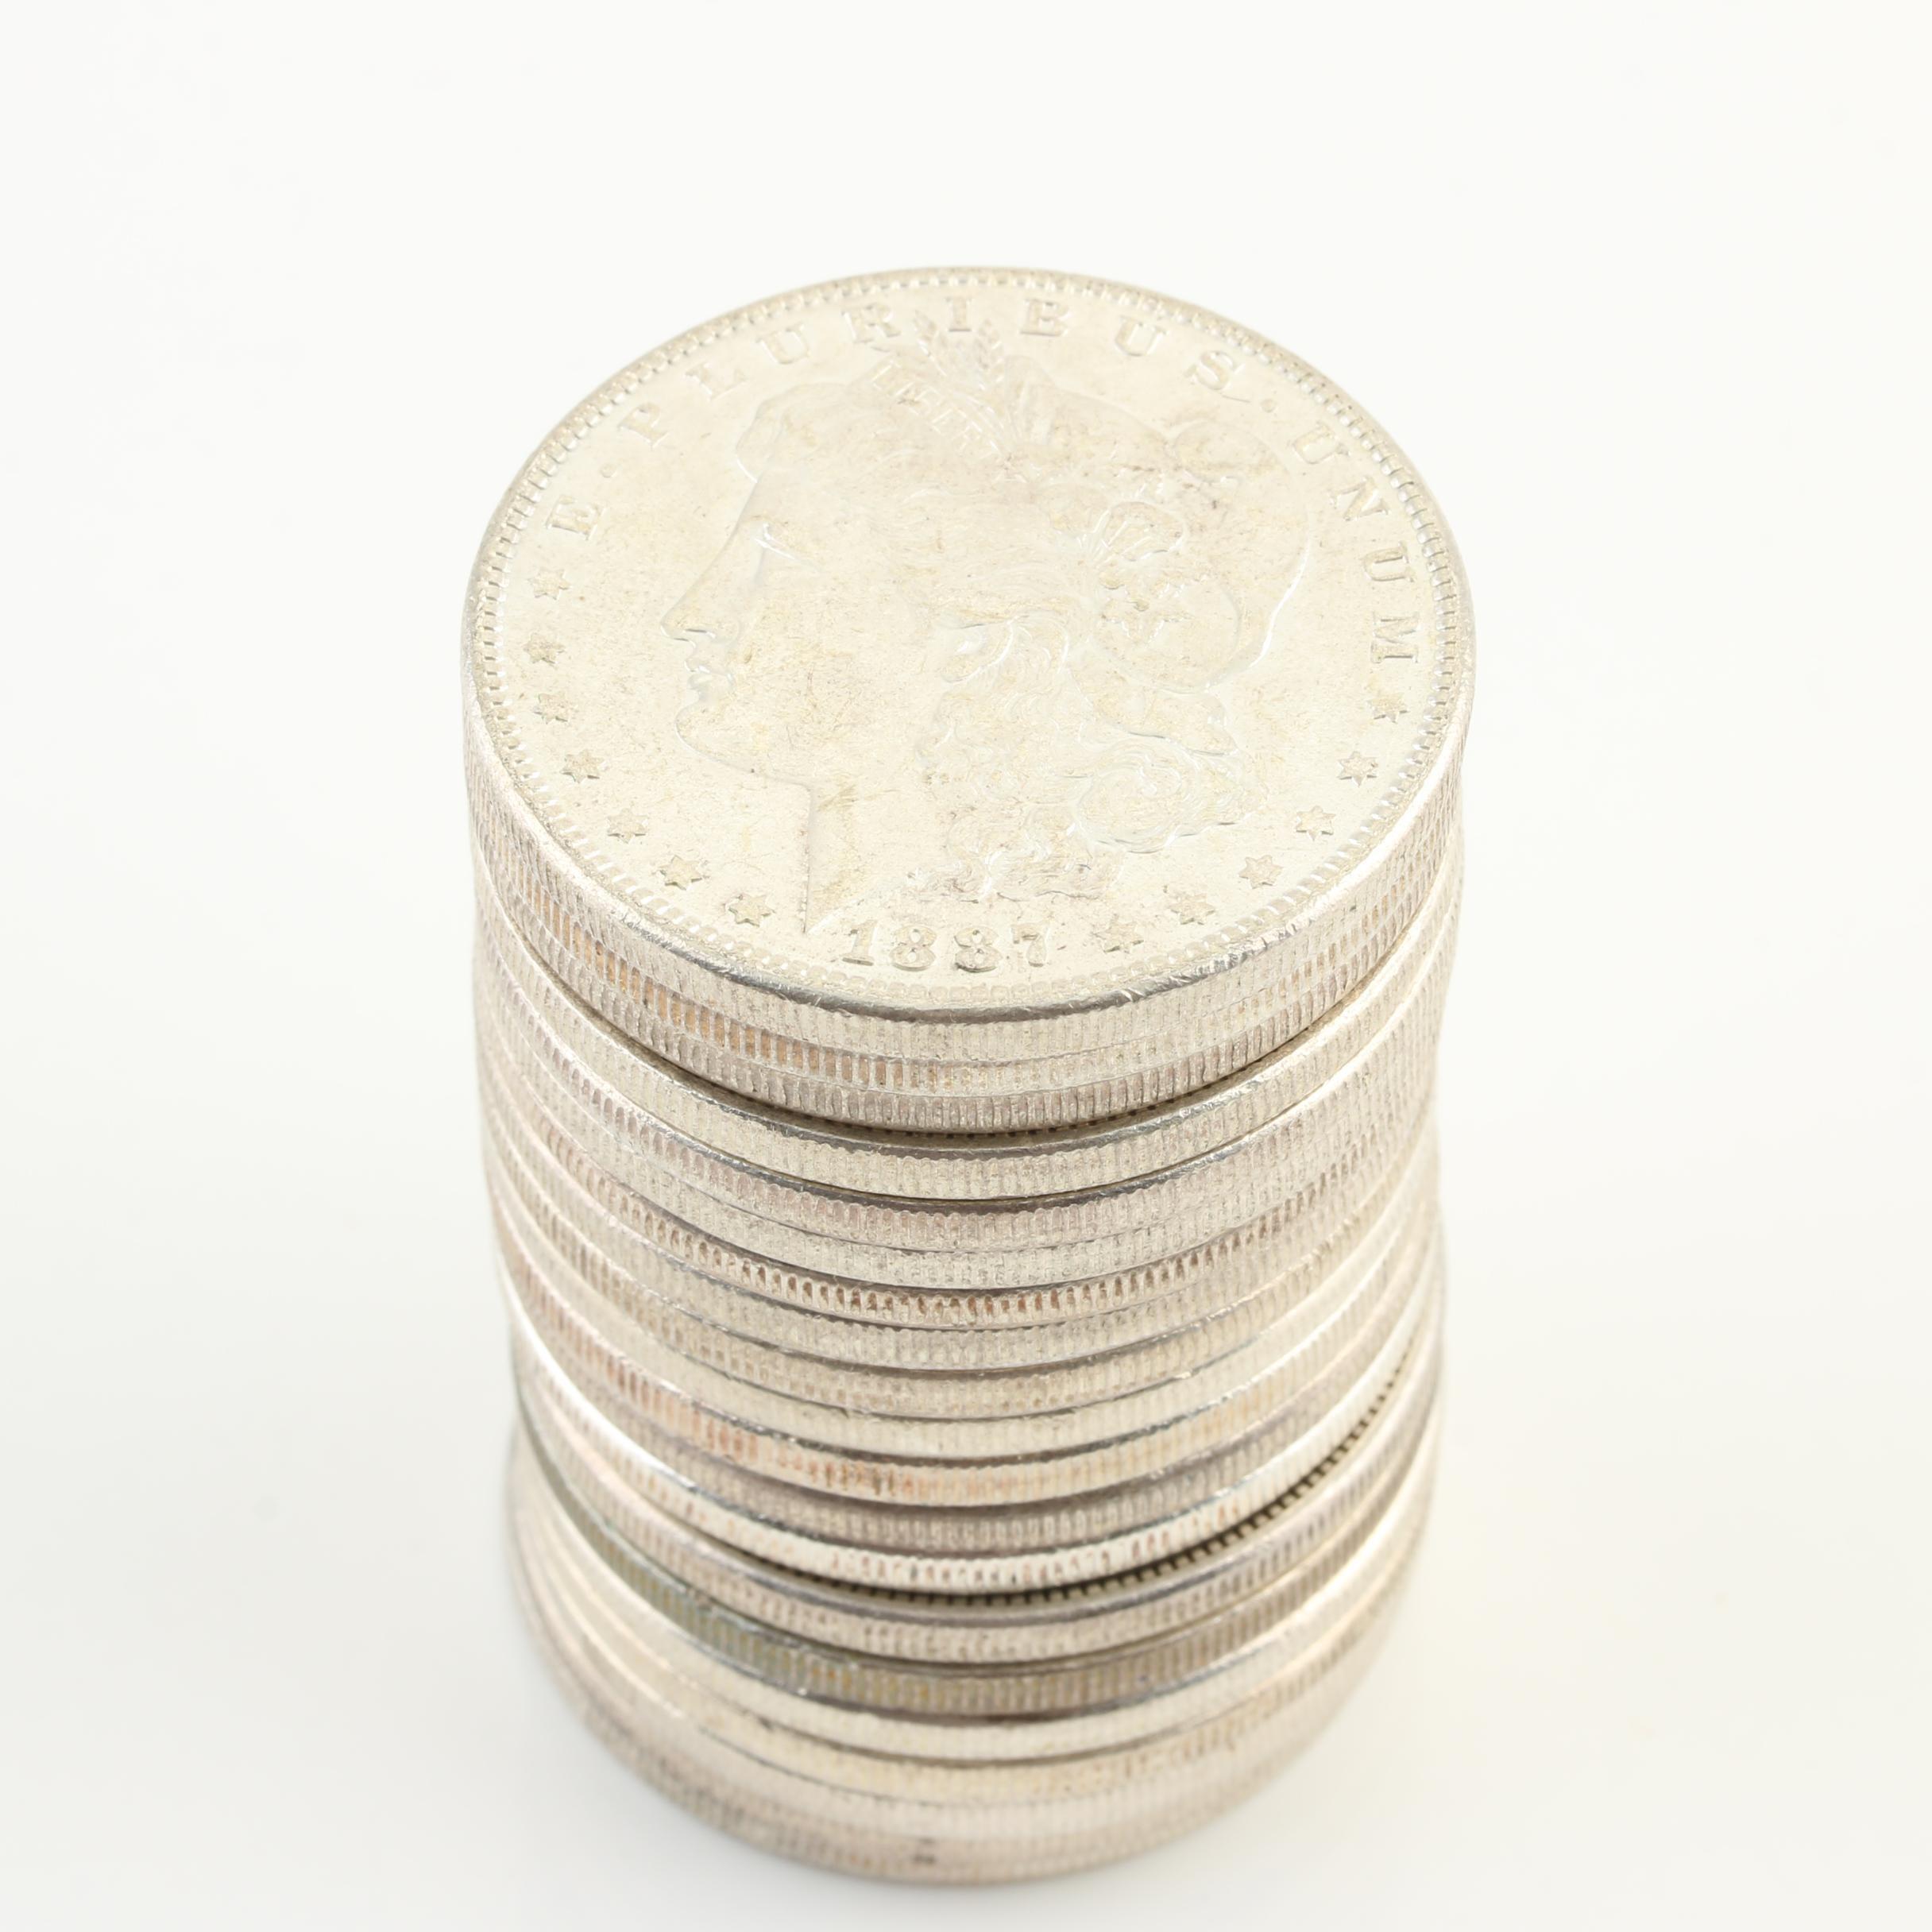 Group of Twenty Uncirculated 1887 Silver Morgan Dollars